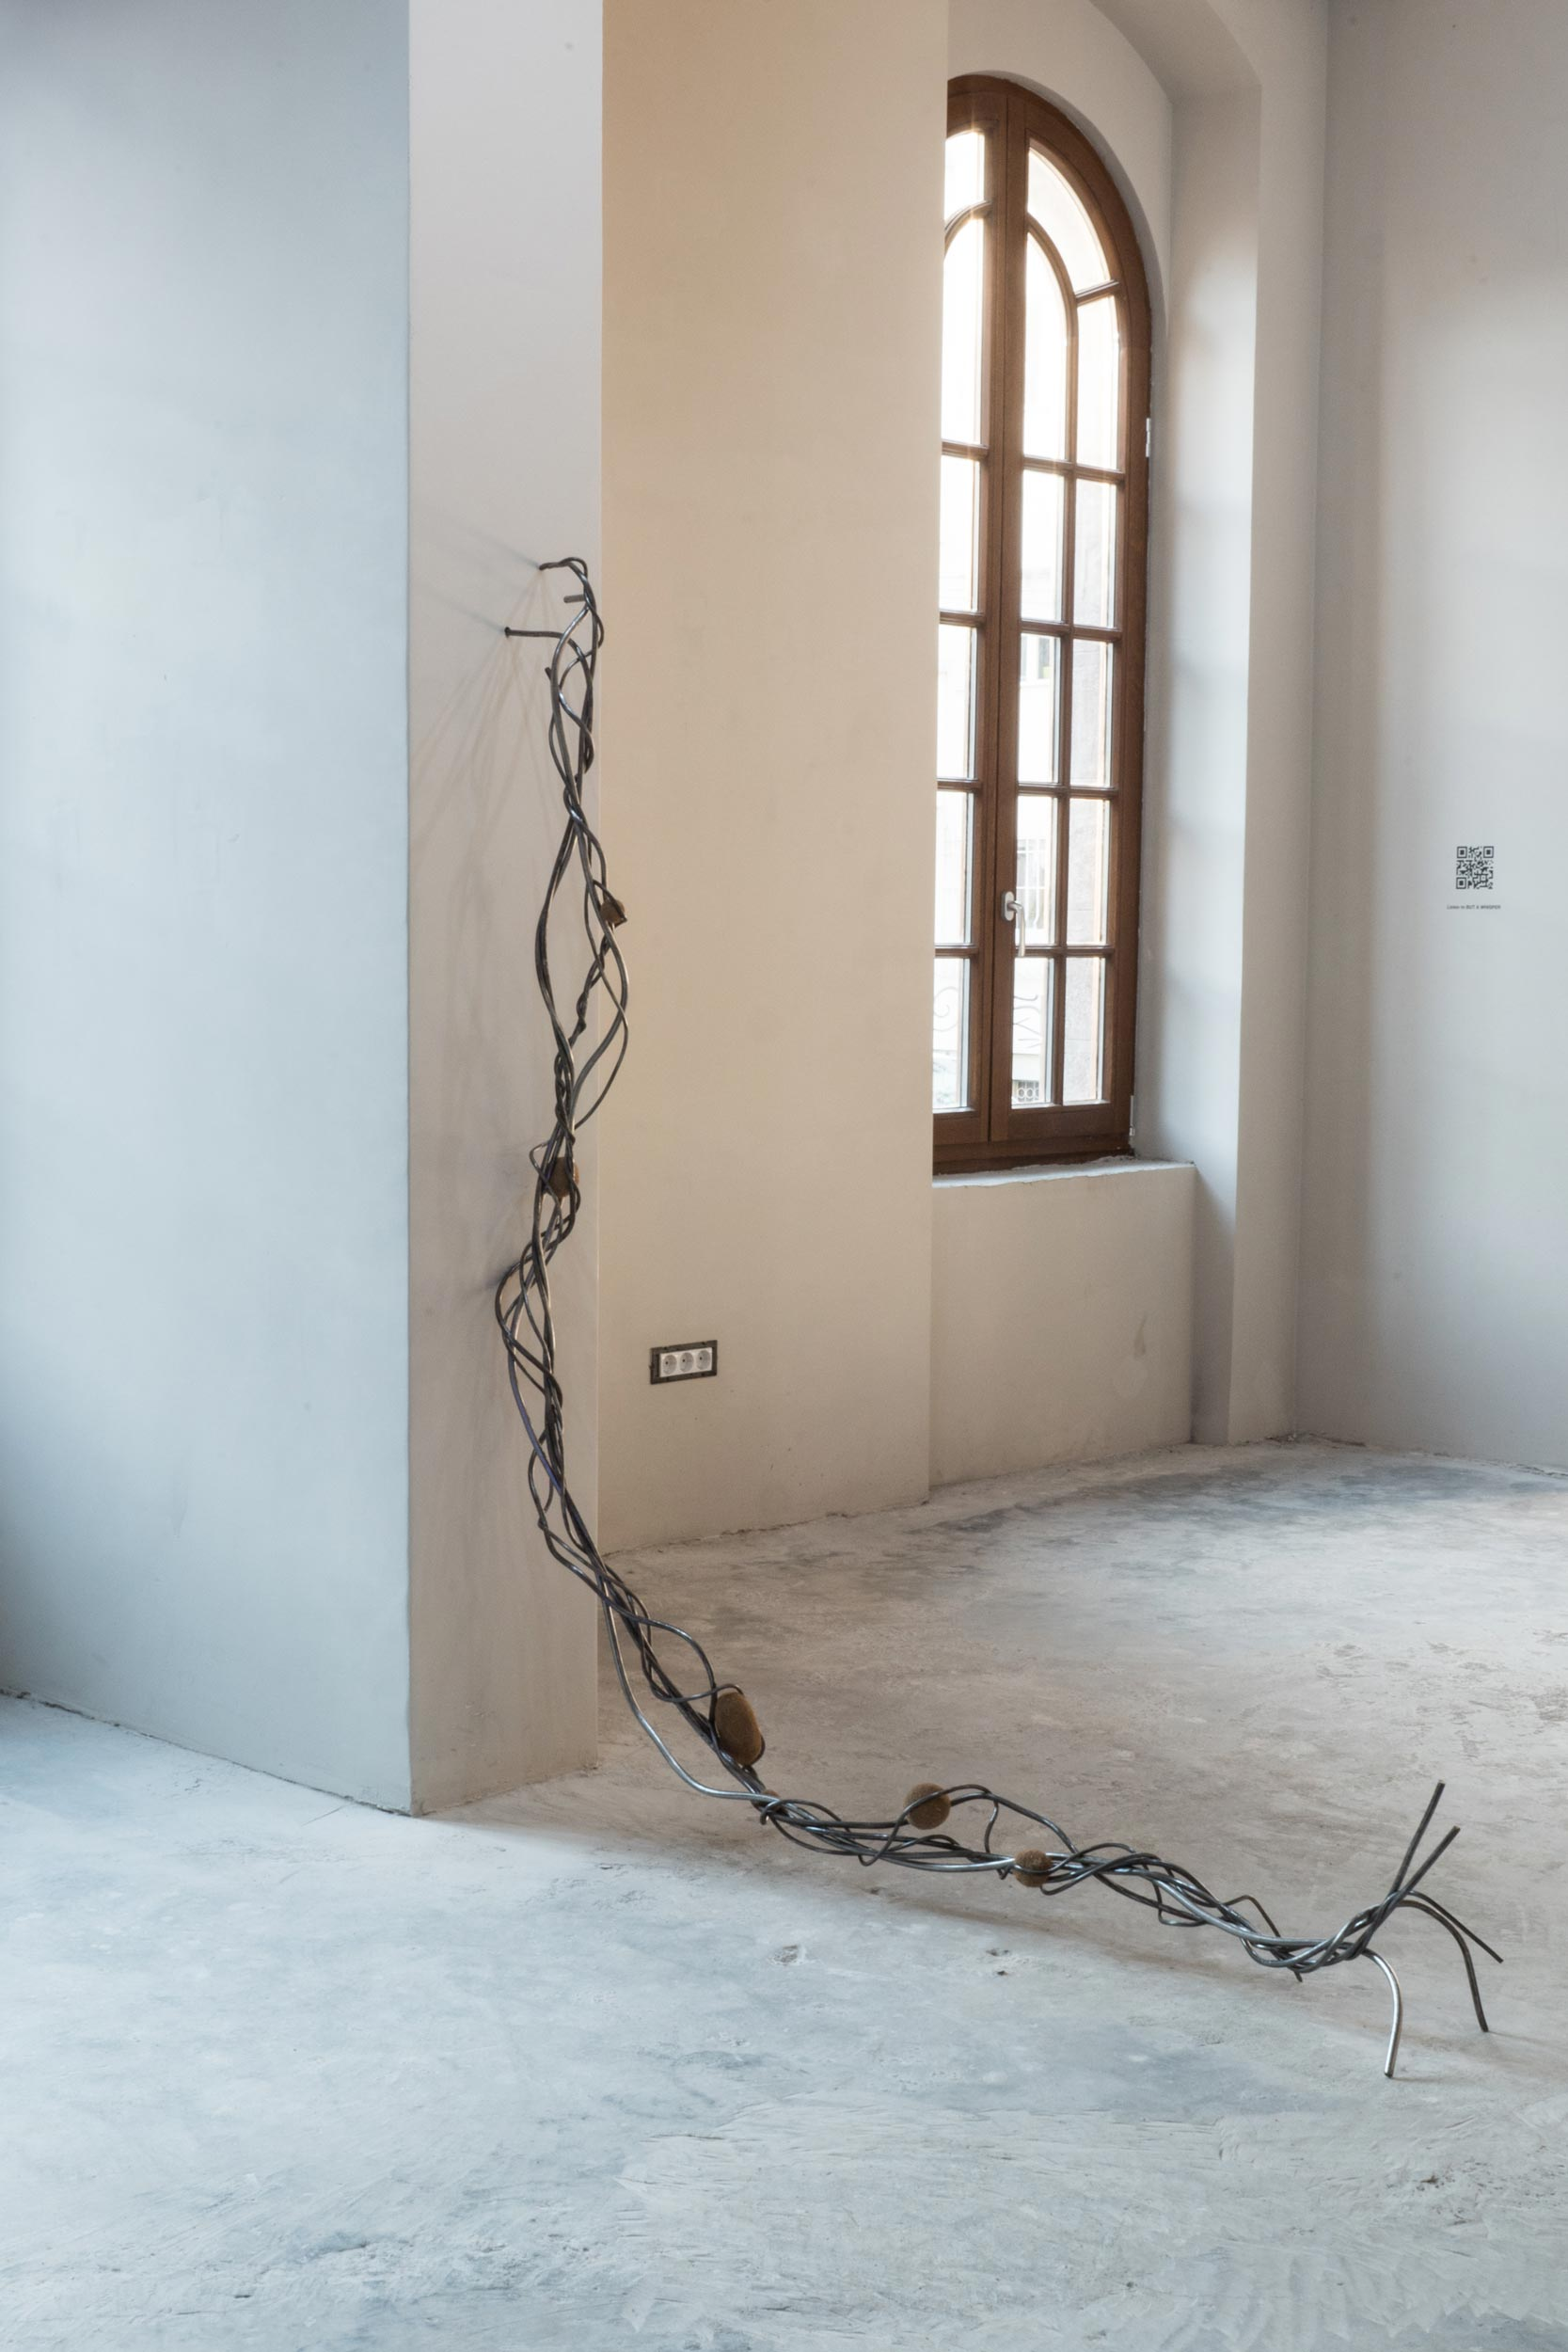 Nona Inescu, 'Intertangle II,' 2021, steel, various vegetal insertions, dimensions variable,